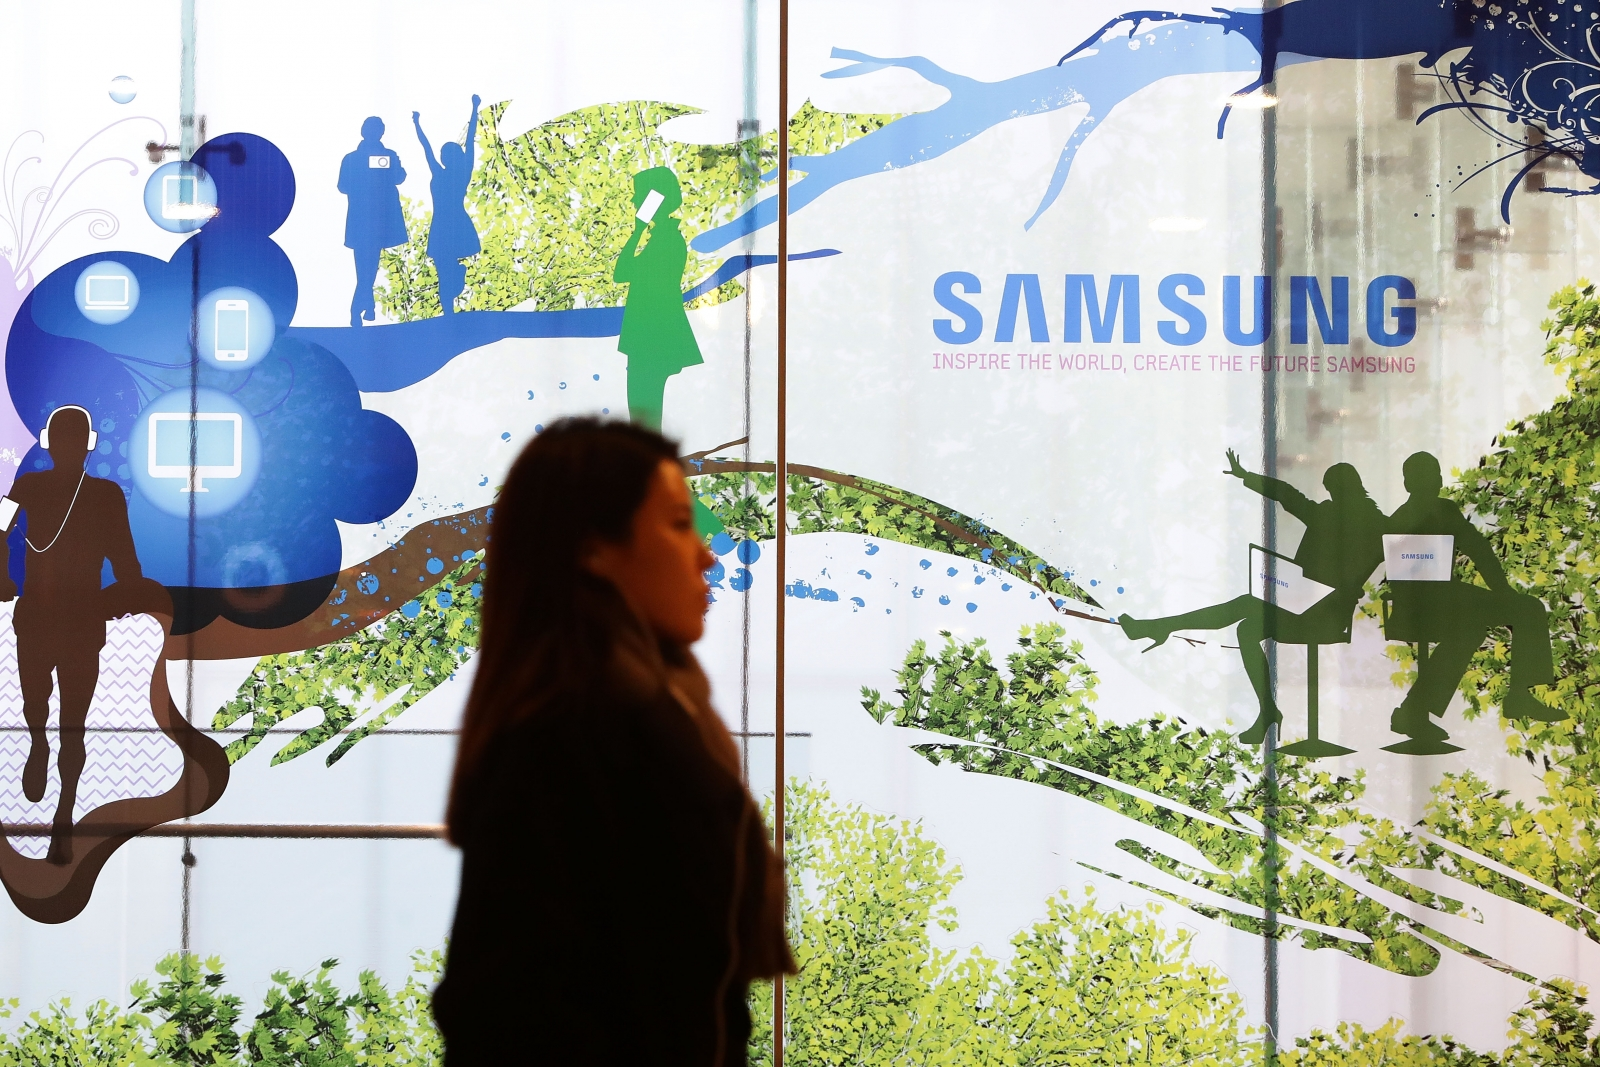 Galaxy S8 might pack 3,250mAh battery